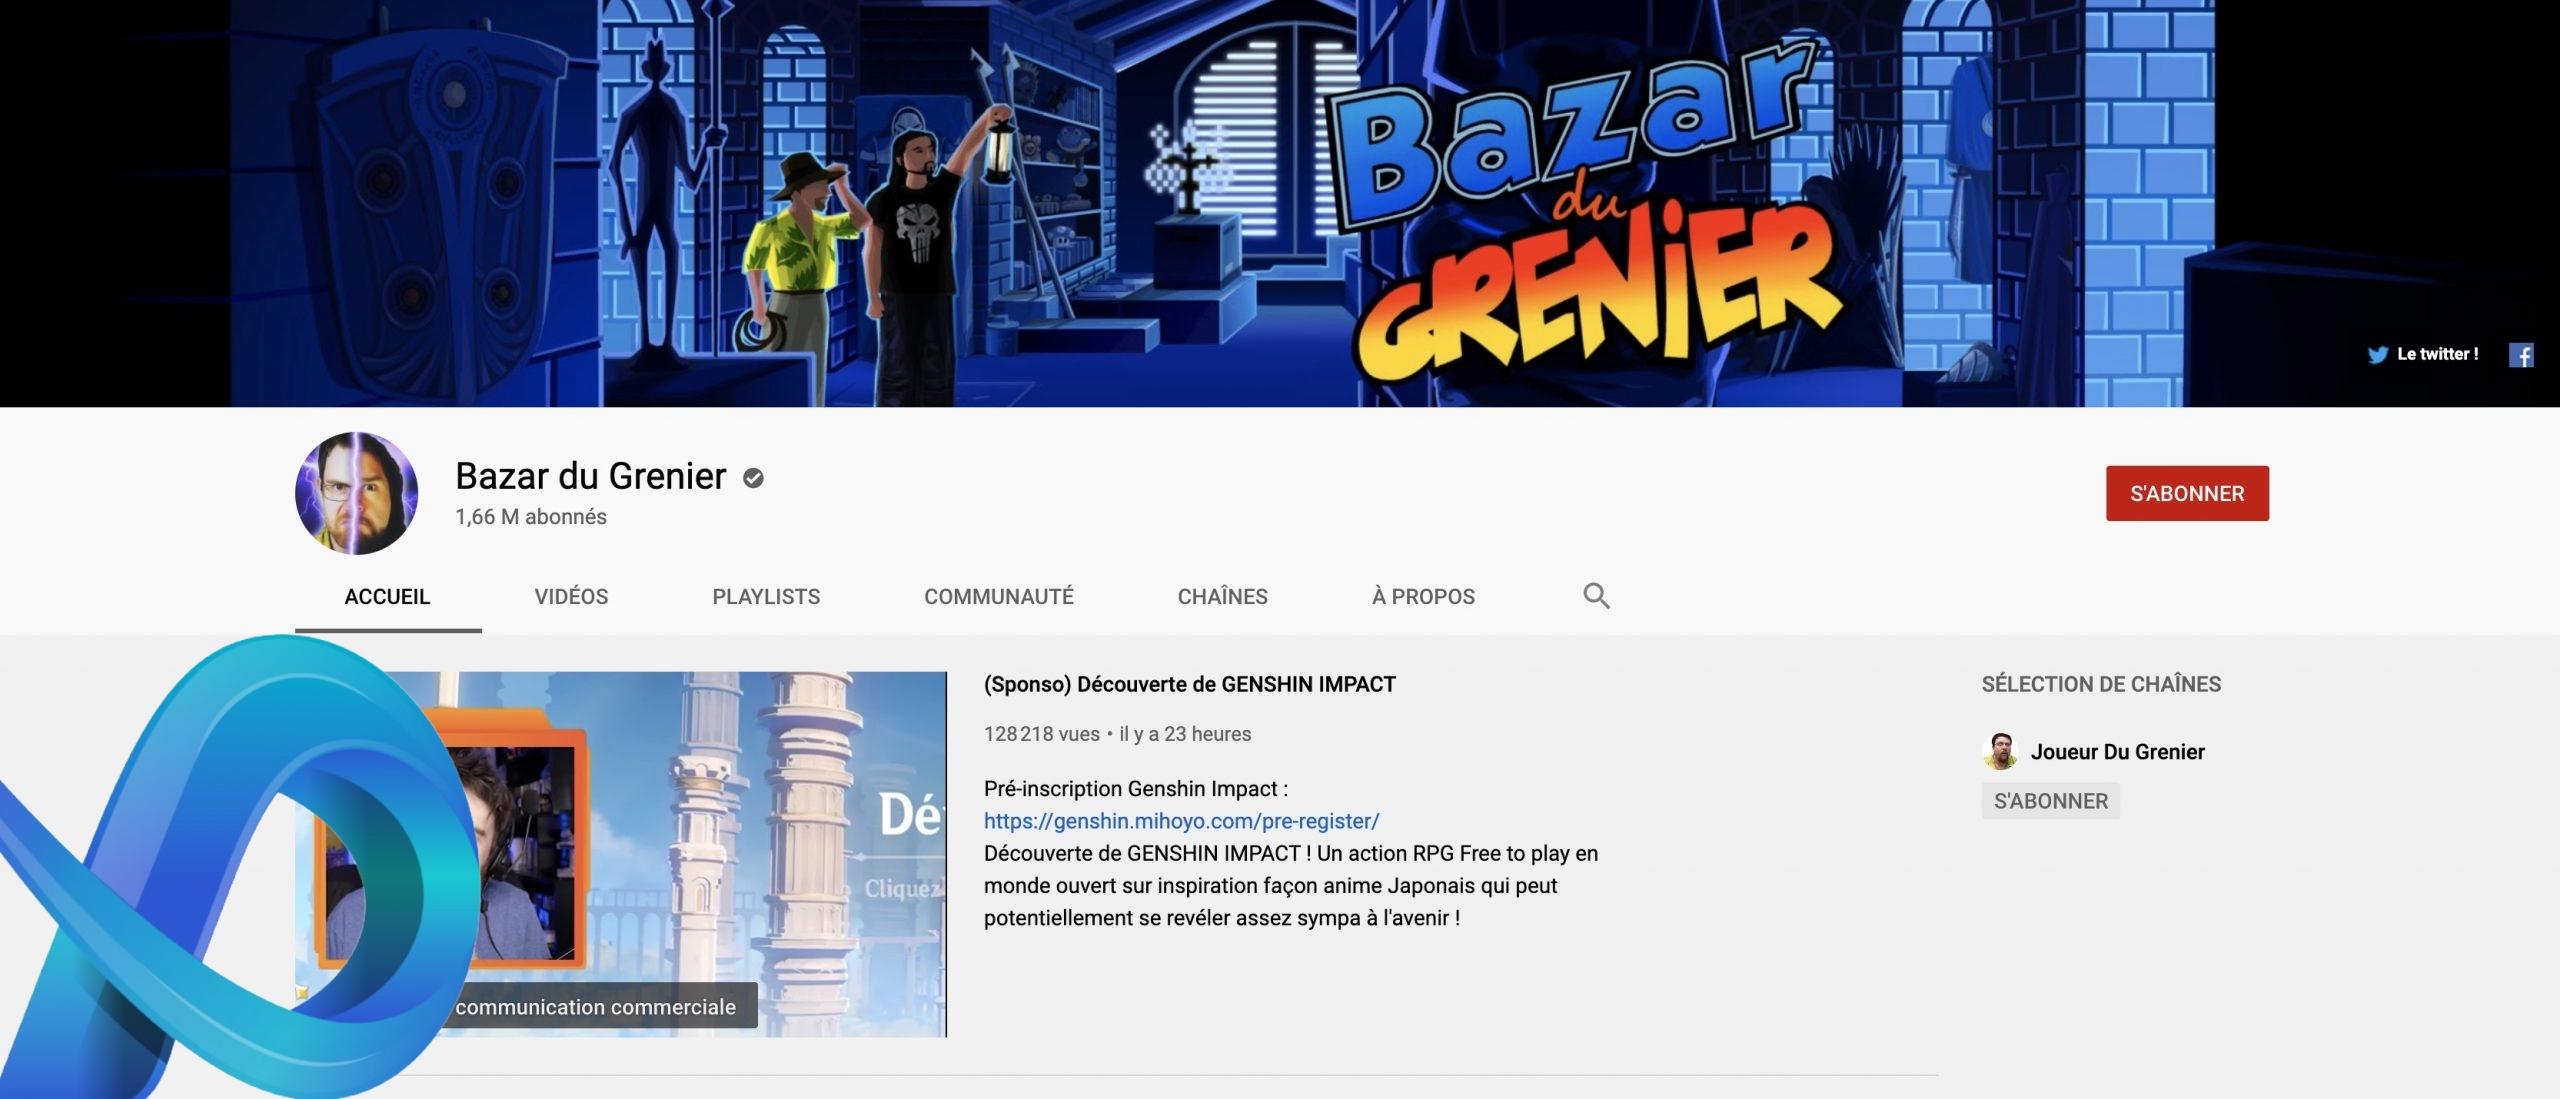 Chaîne YouTube du Bazar du Grenier